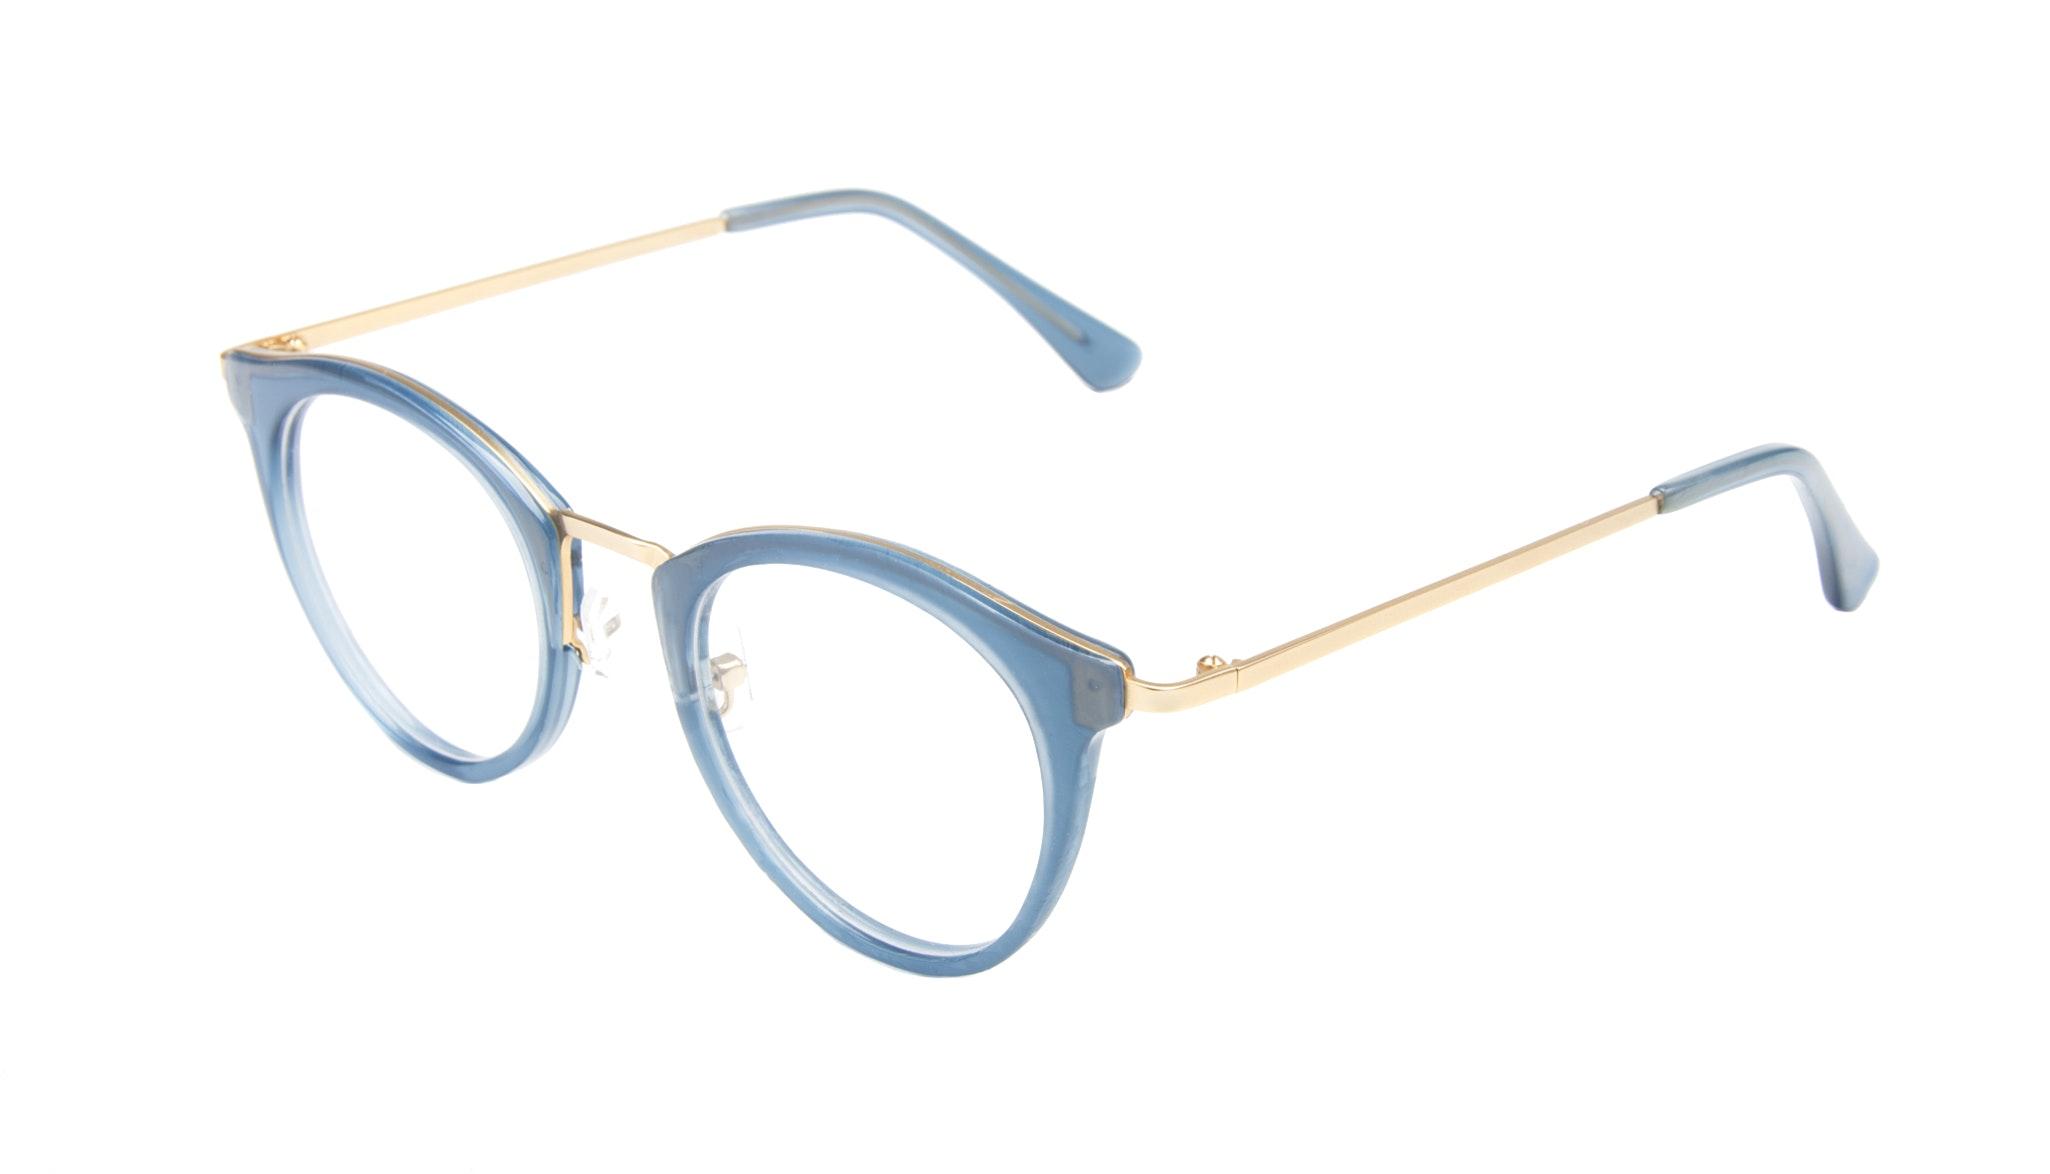 Affordable Fashion Glasses Cat Eye Round Eyeglasses Women Creature Marine Tilt